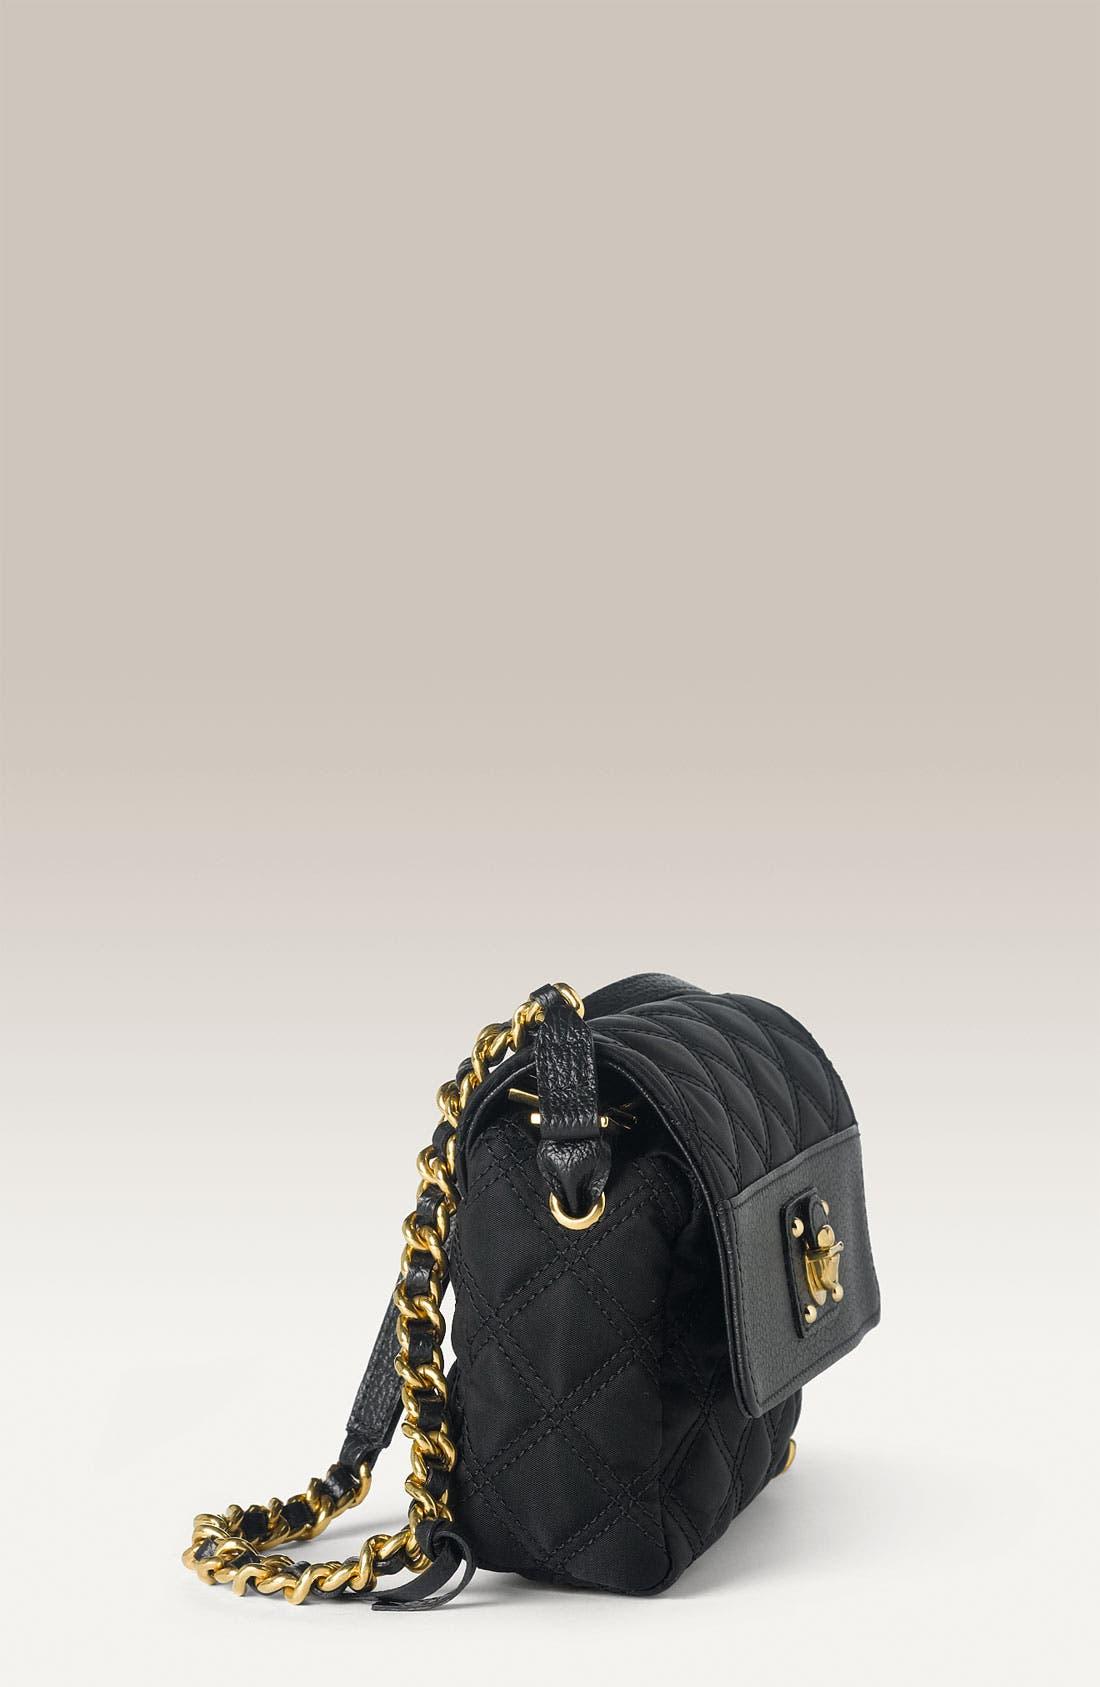 'Debbie' Quilted Nylon Crossbody Bag,                             Alternate thumbnail 2, color,                             001